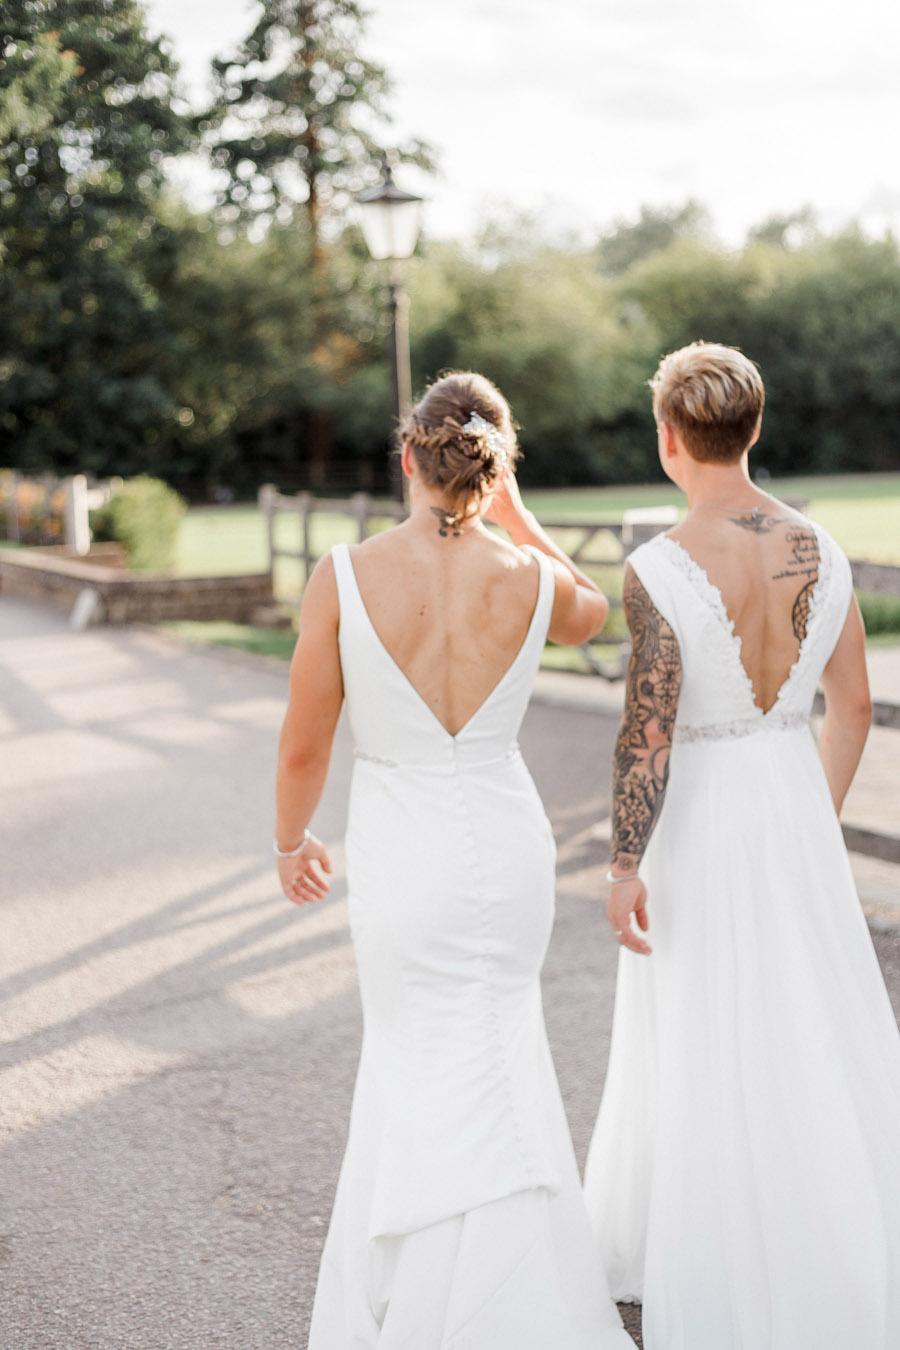 Tewin Bury farm wedding blog, photo credit Absolute Photo UK (35)